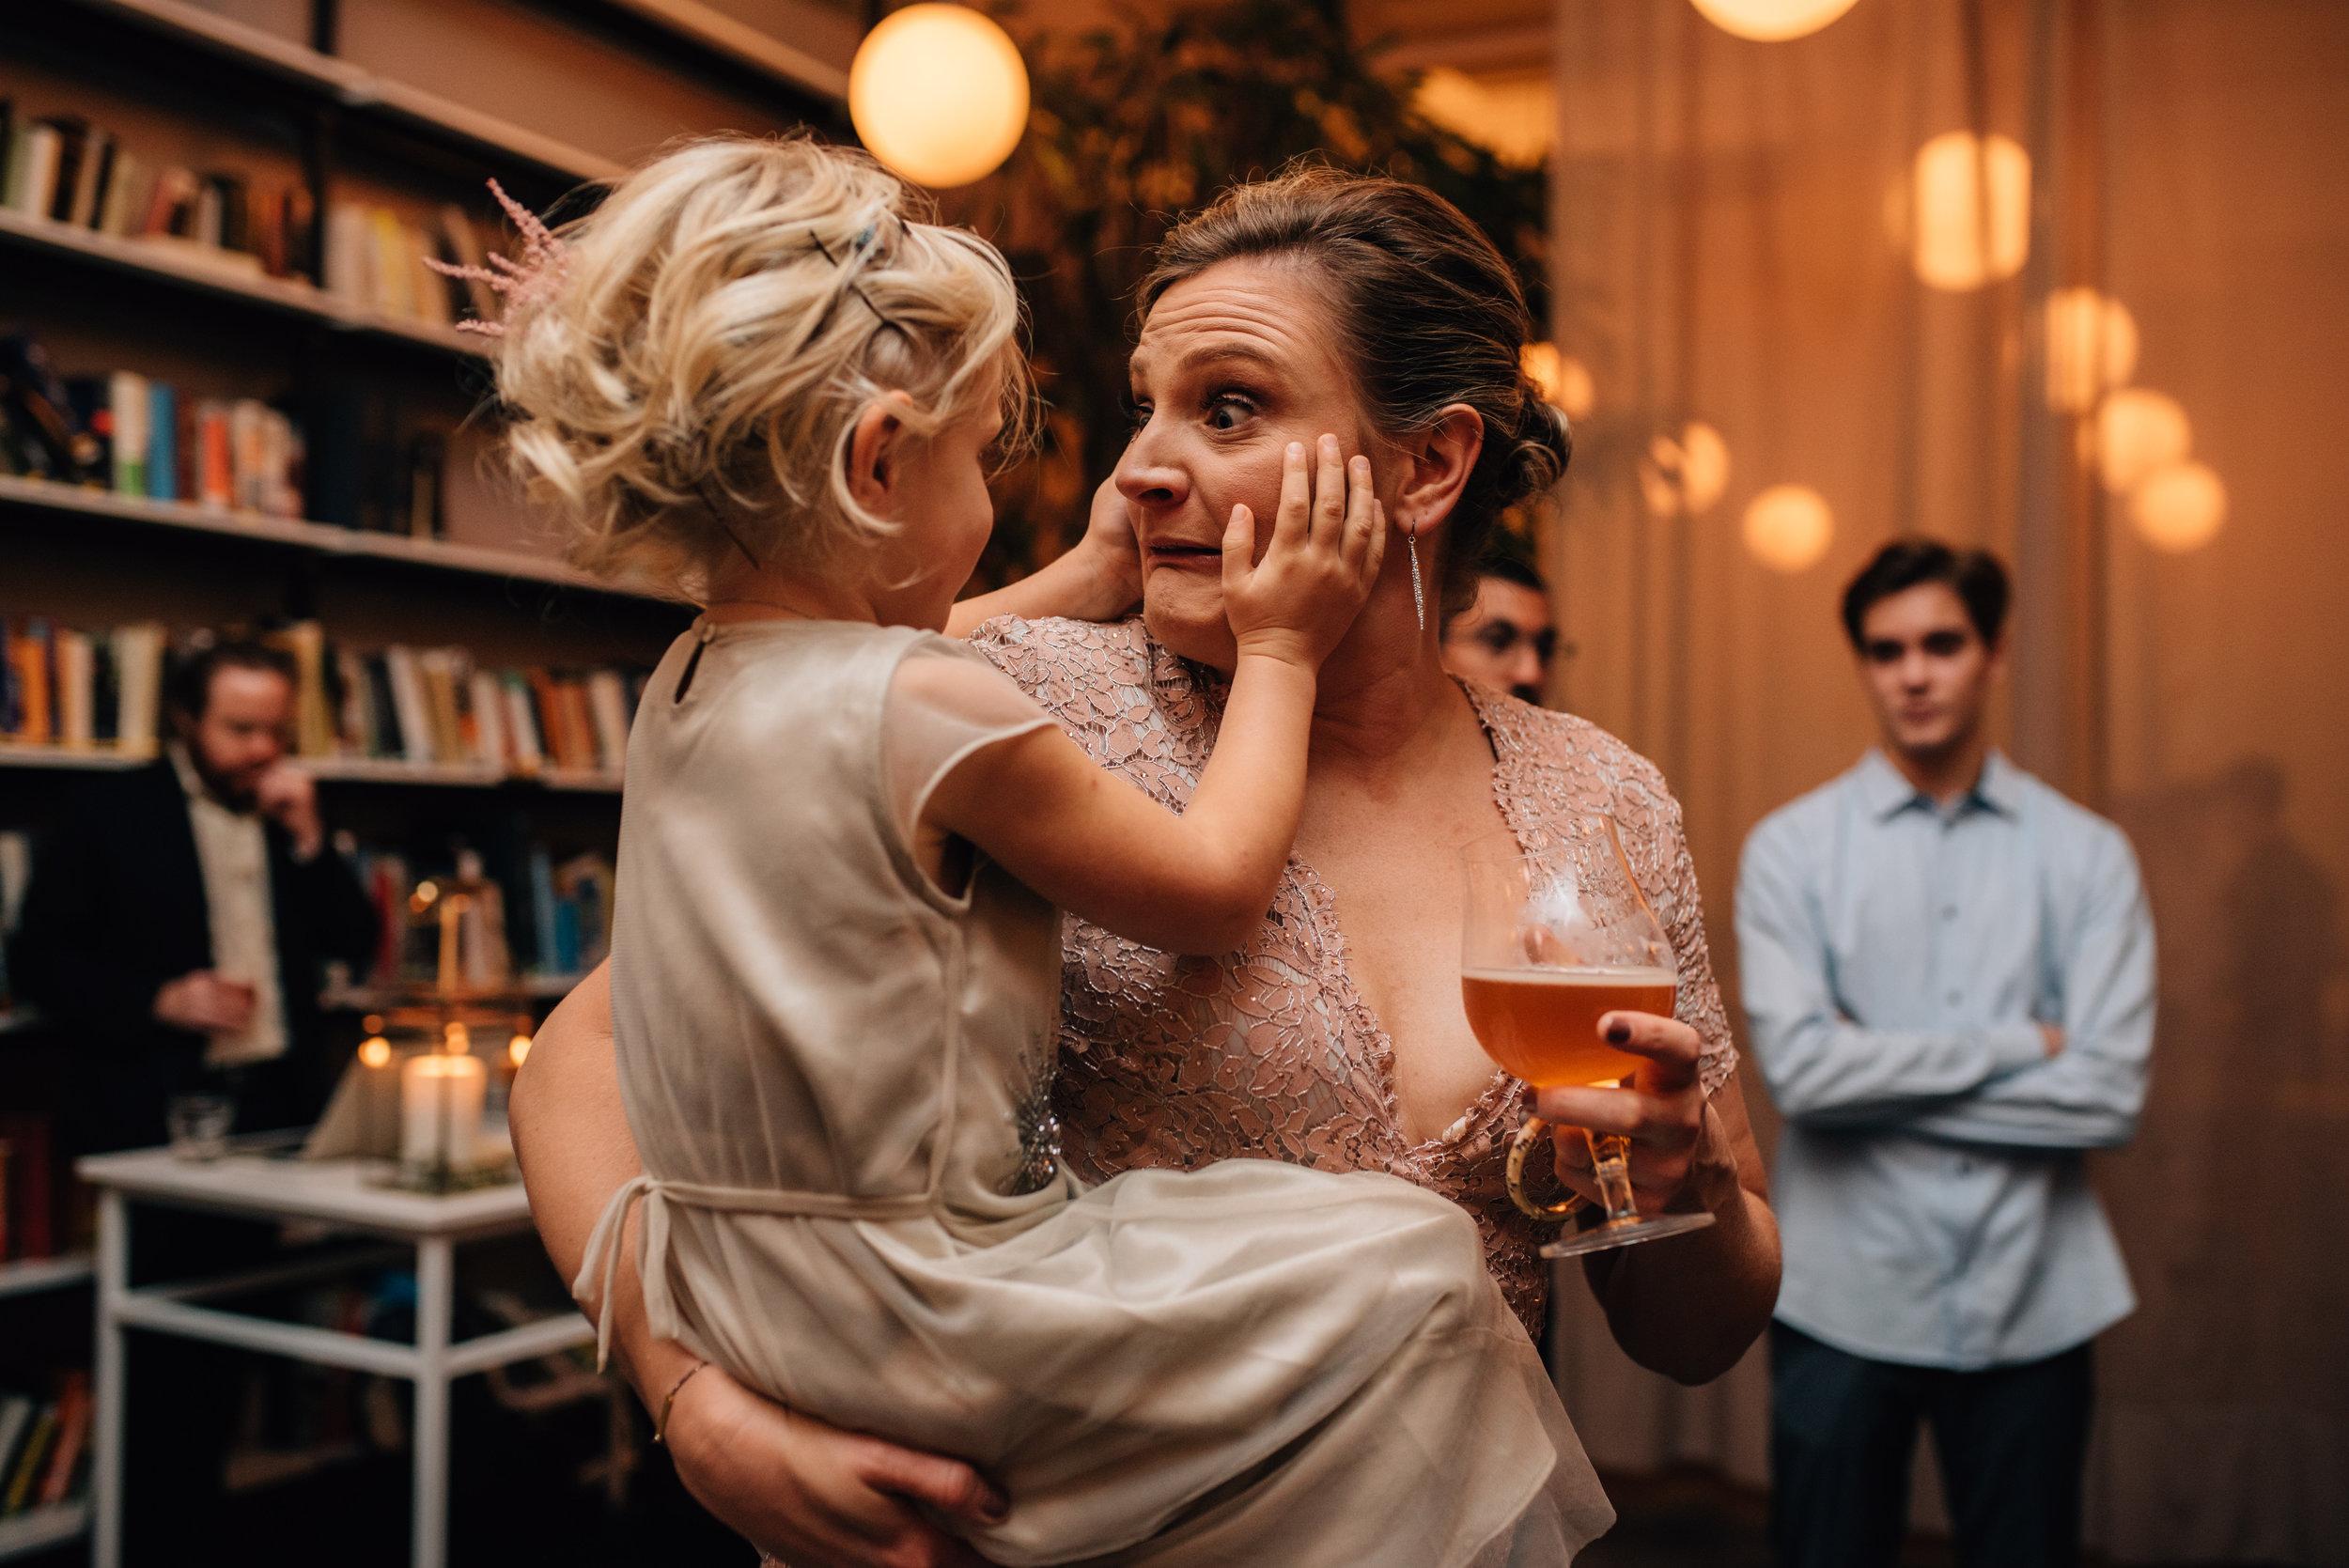 Brewery Bhavana Wedding - Raleigh Wedding Photographer - North Carolina Wedding Photographer